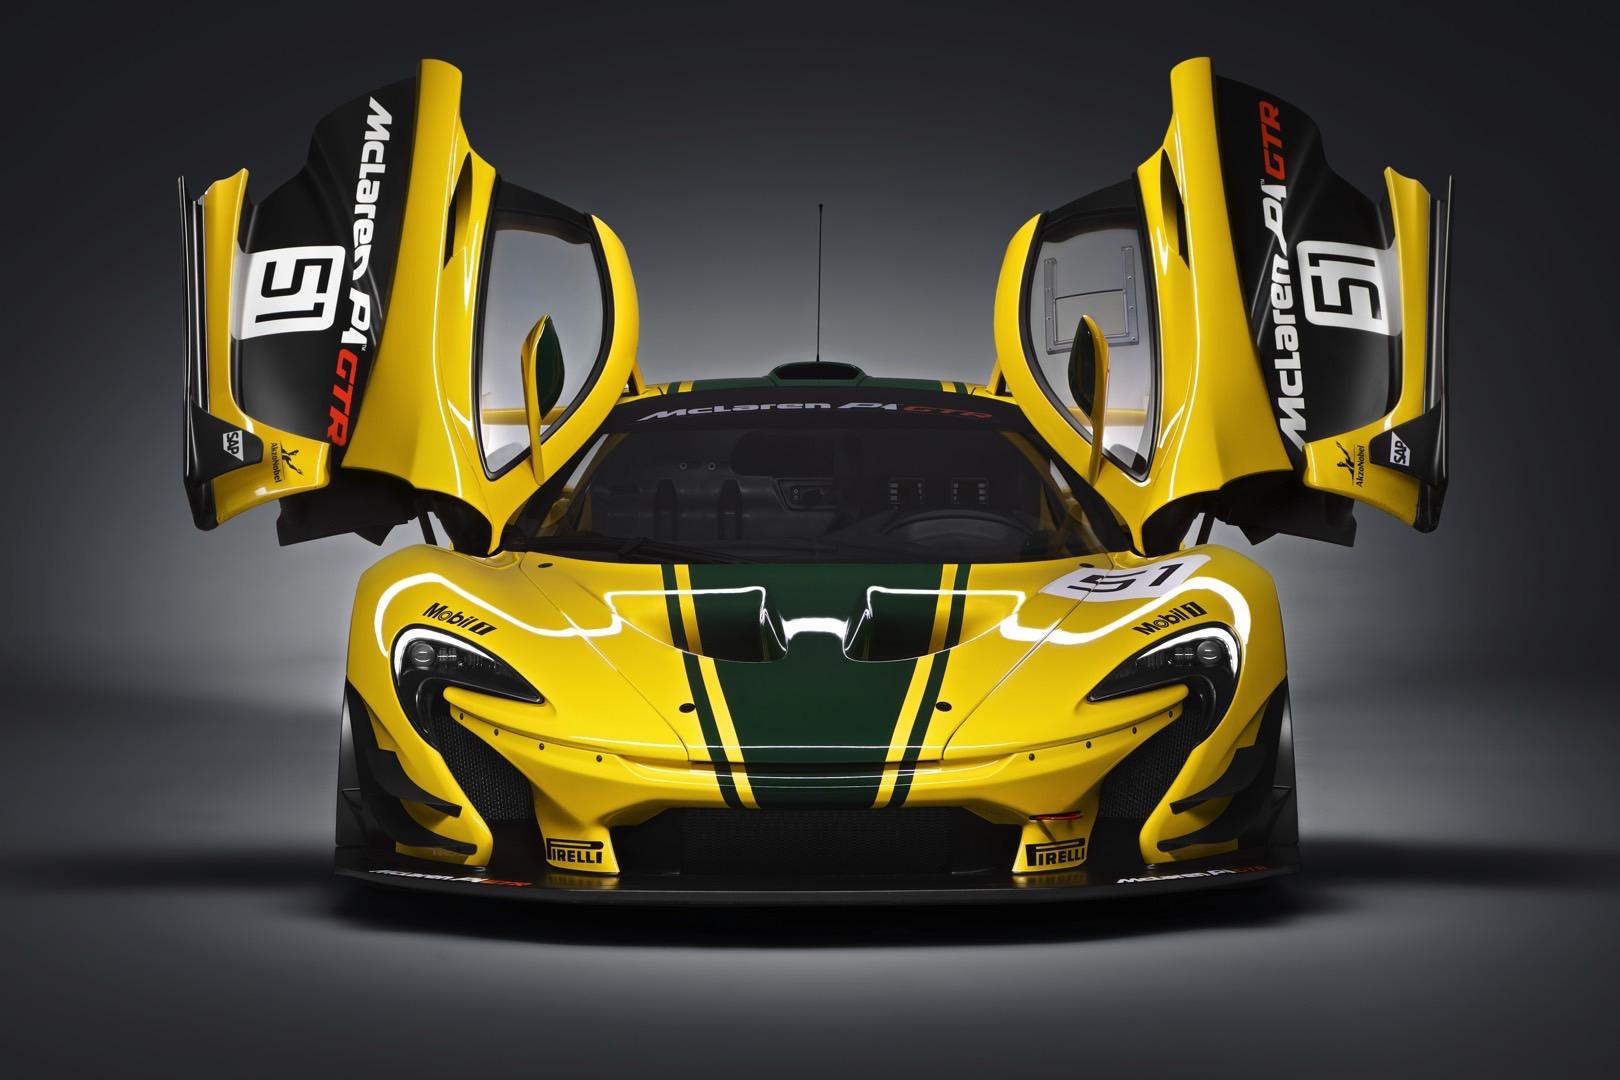 https://s1.cdn.autoevolution.com/images/news/2015-mclaren-p1-gtr-unveiled-ahead-of-geneva-motor-show-debut-photo-gallery-92415_1.jpg